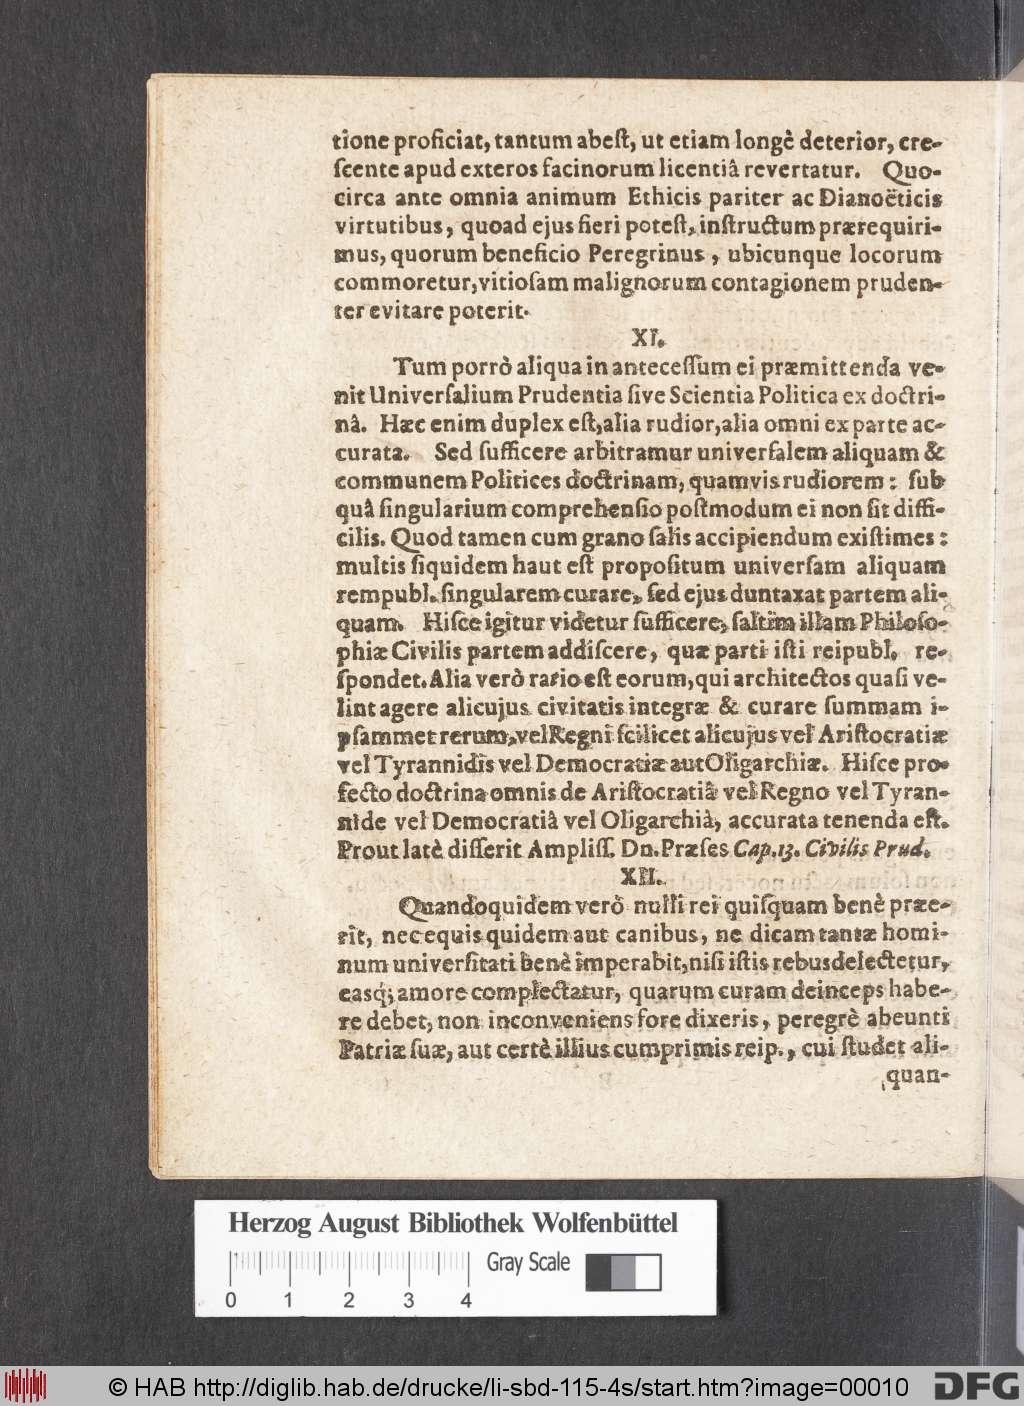 http://diglib.hab.de/drucke/li-sbd-115-4s/00010.jpg